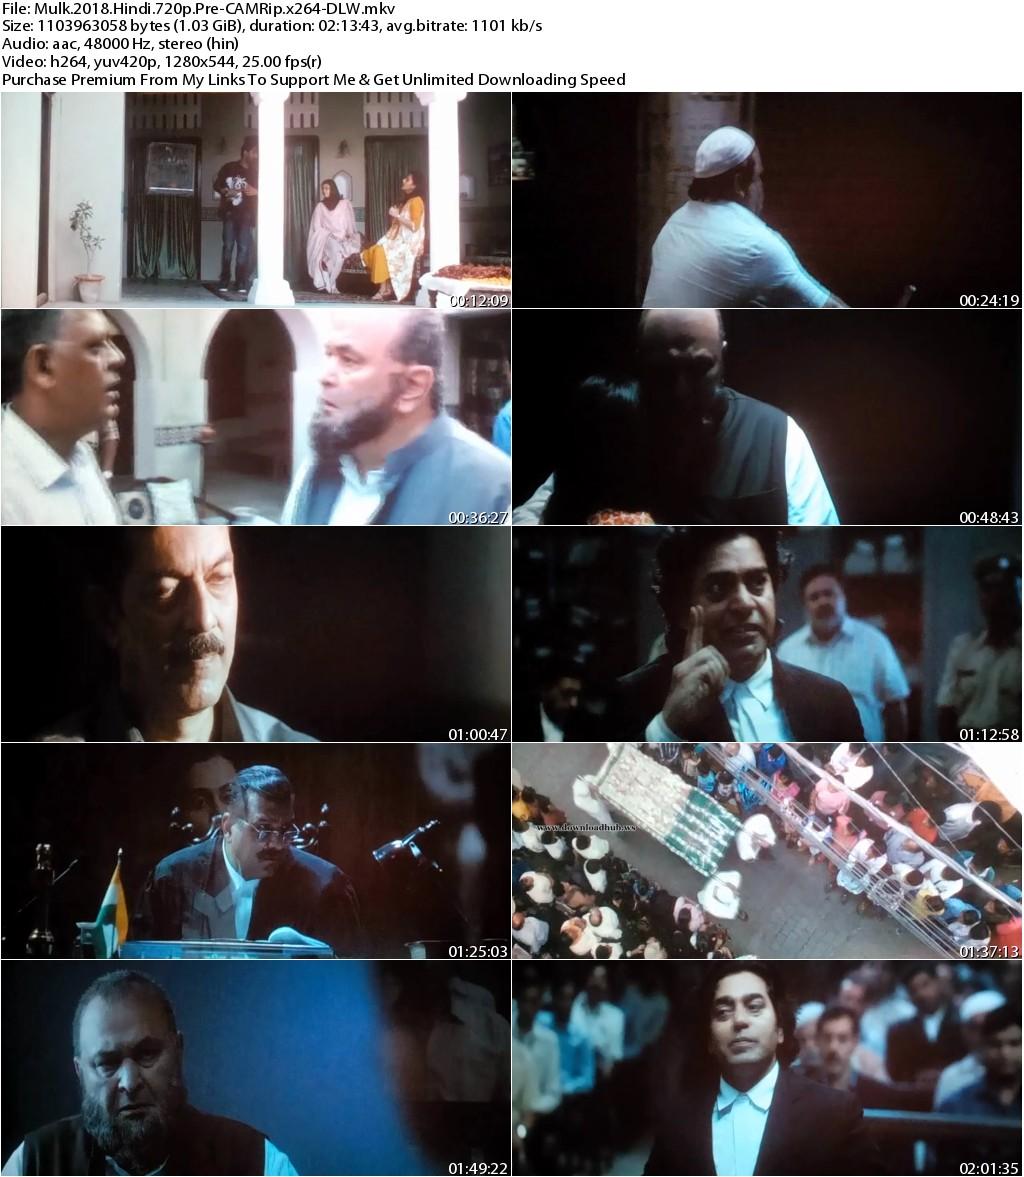 Mulk (2018) Hindi 720p Pre-CAMRip x264-DLW